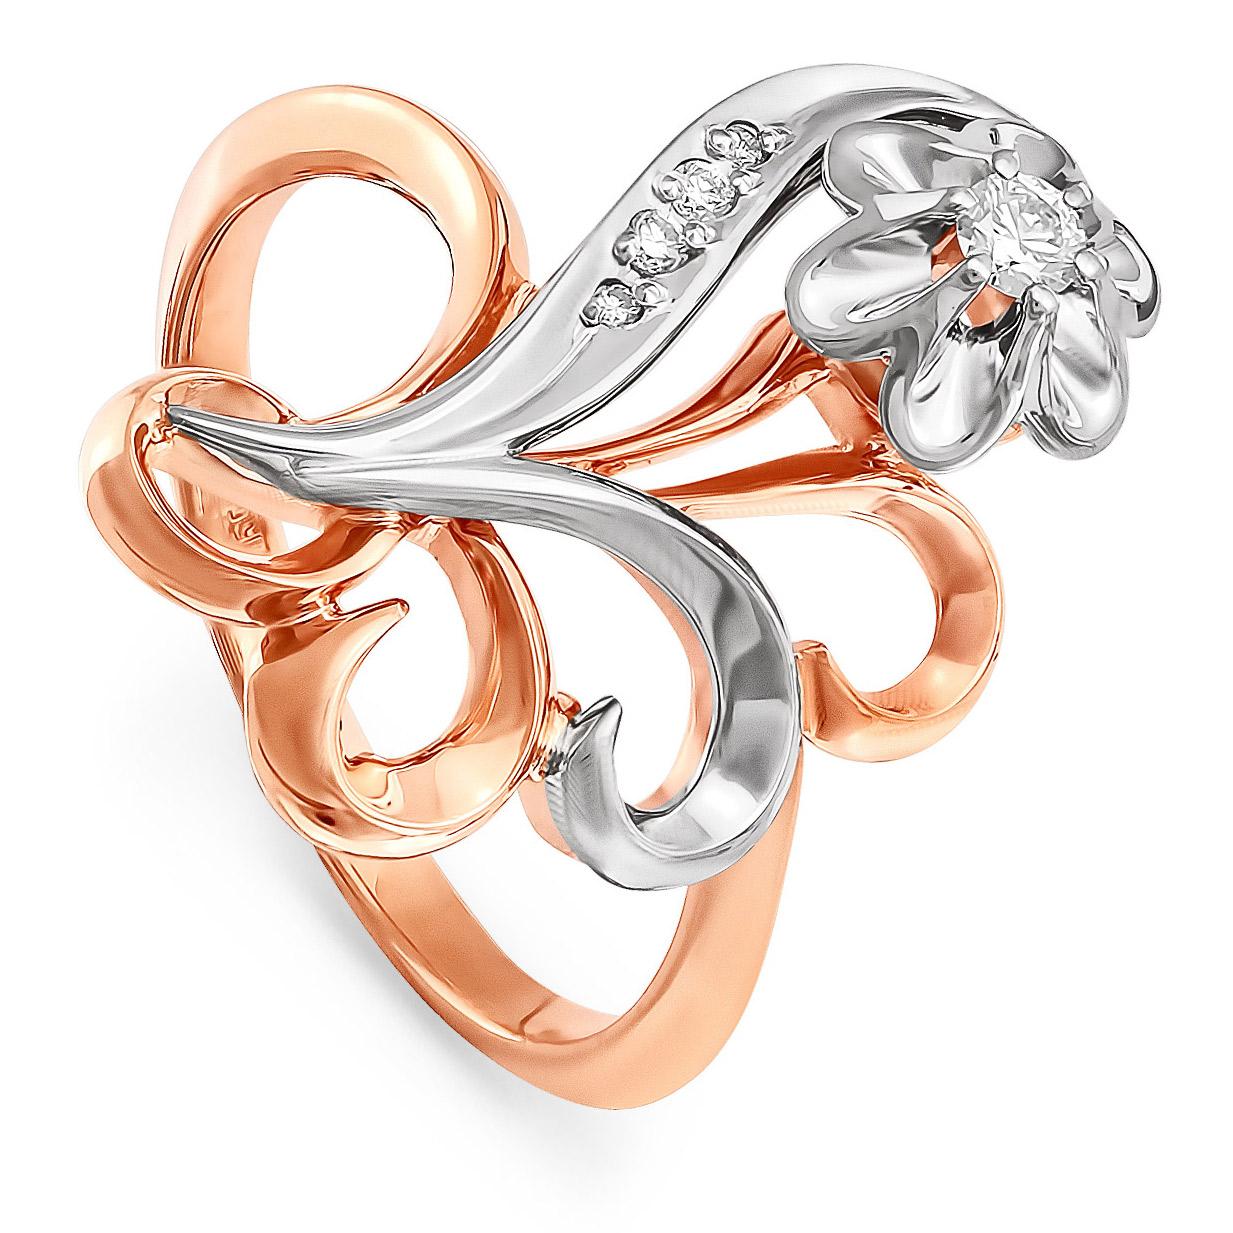 Золотое кольцо Бриллиант арт. 11-0067 11-0067